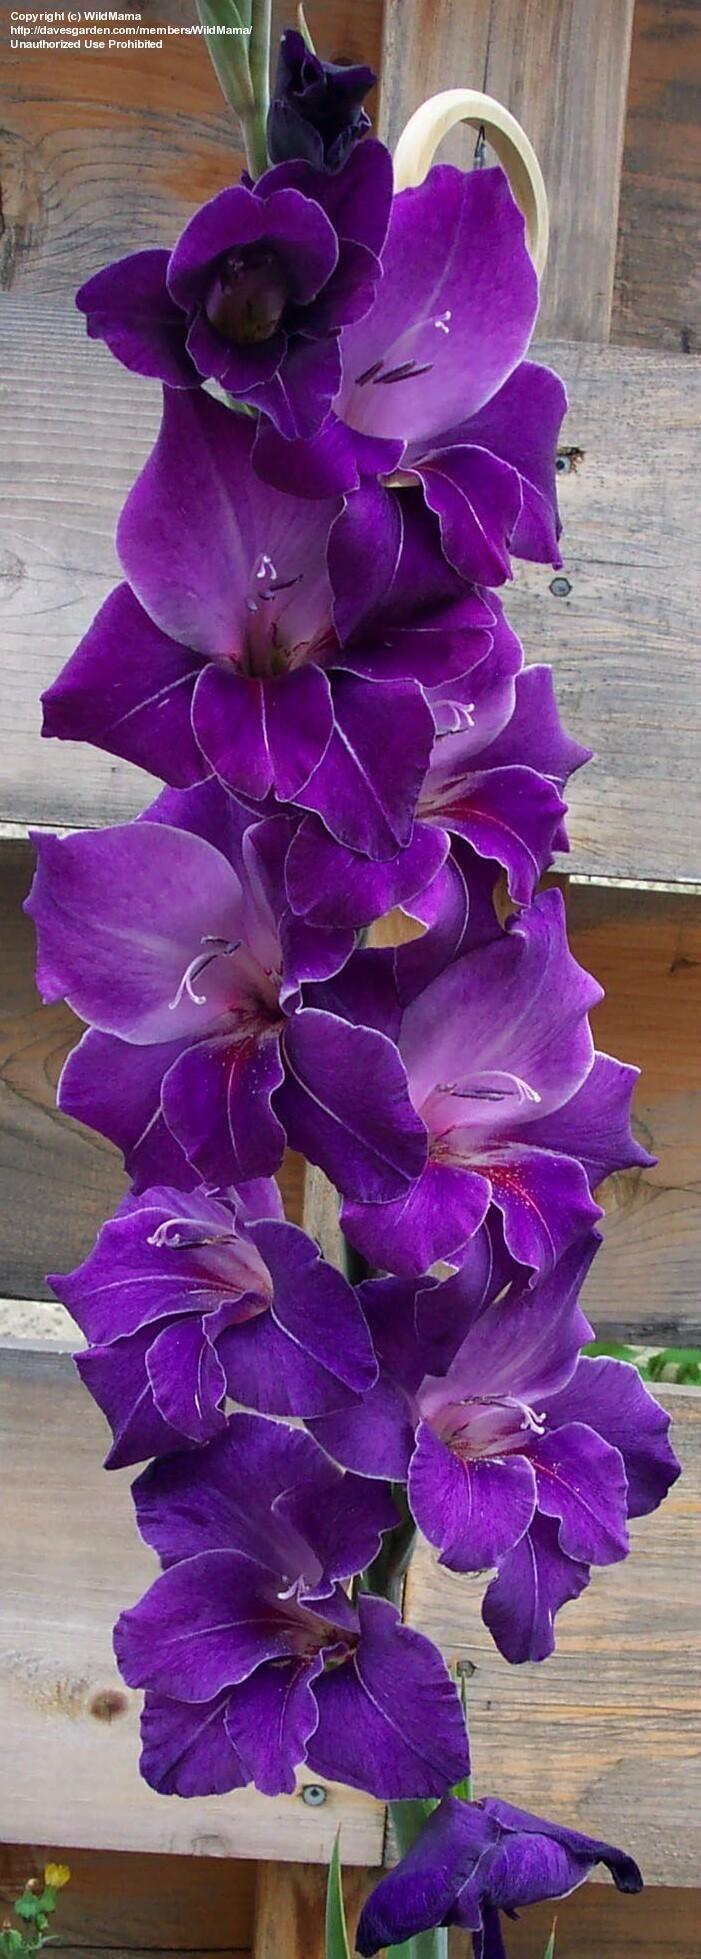 Гладиолус сорта Violetta